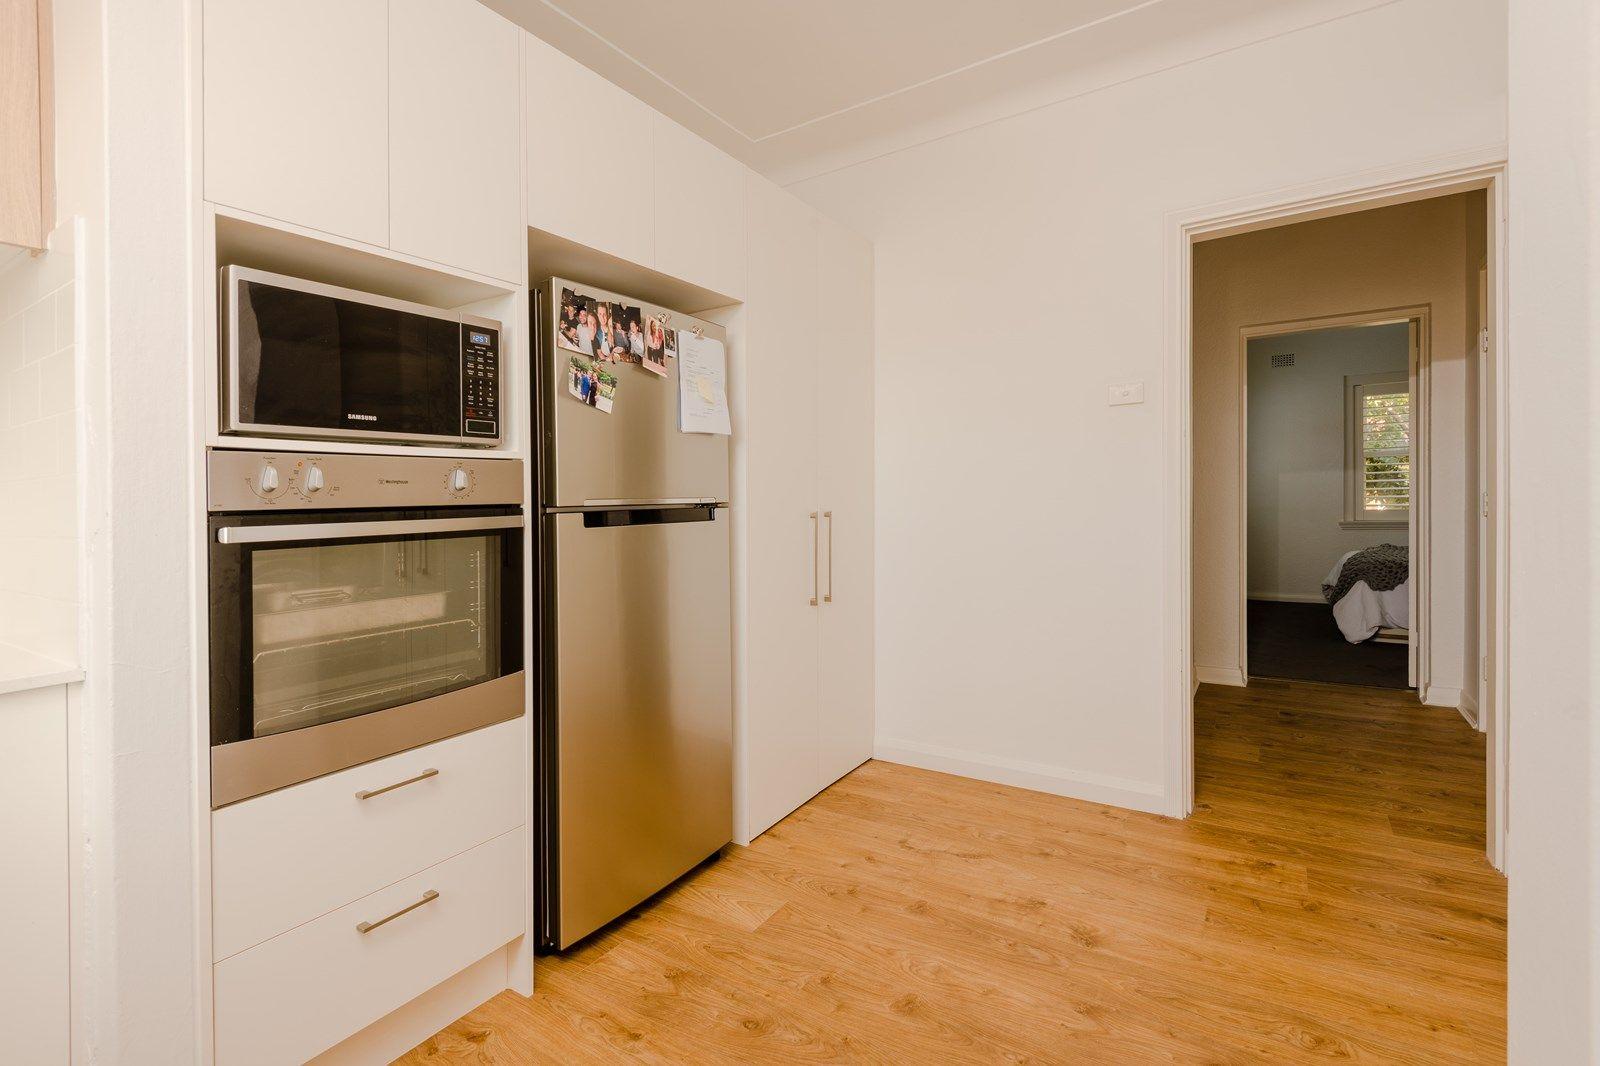 13/94A Birriga, Bellevue Hill NSW 2023, Image 2